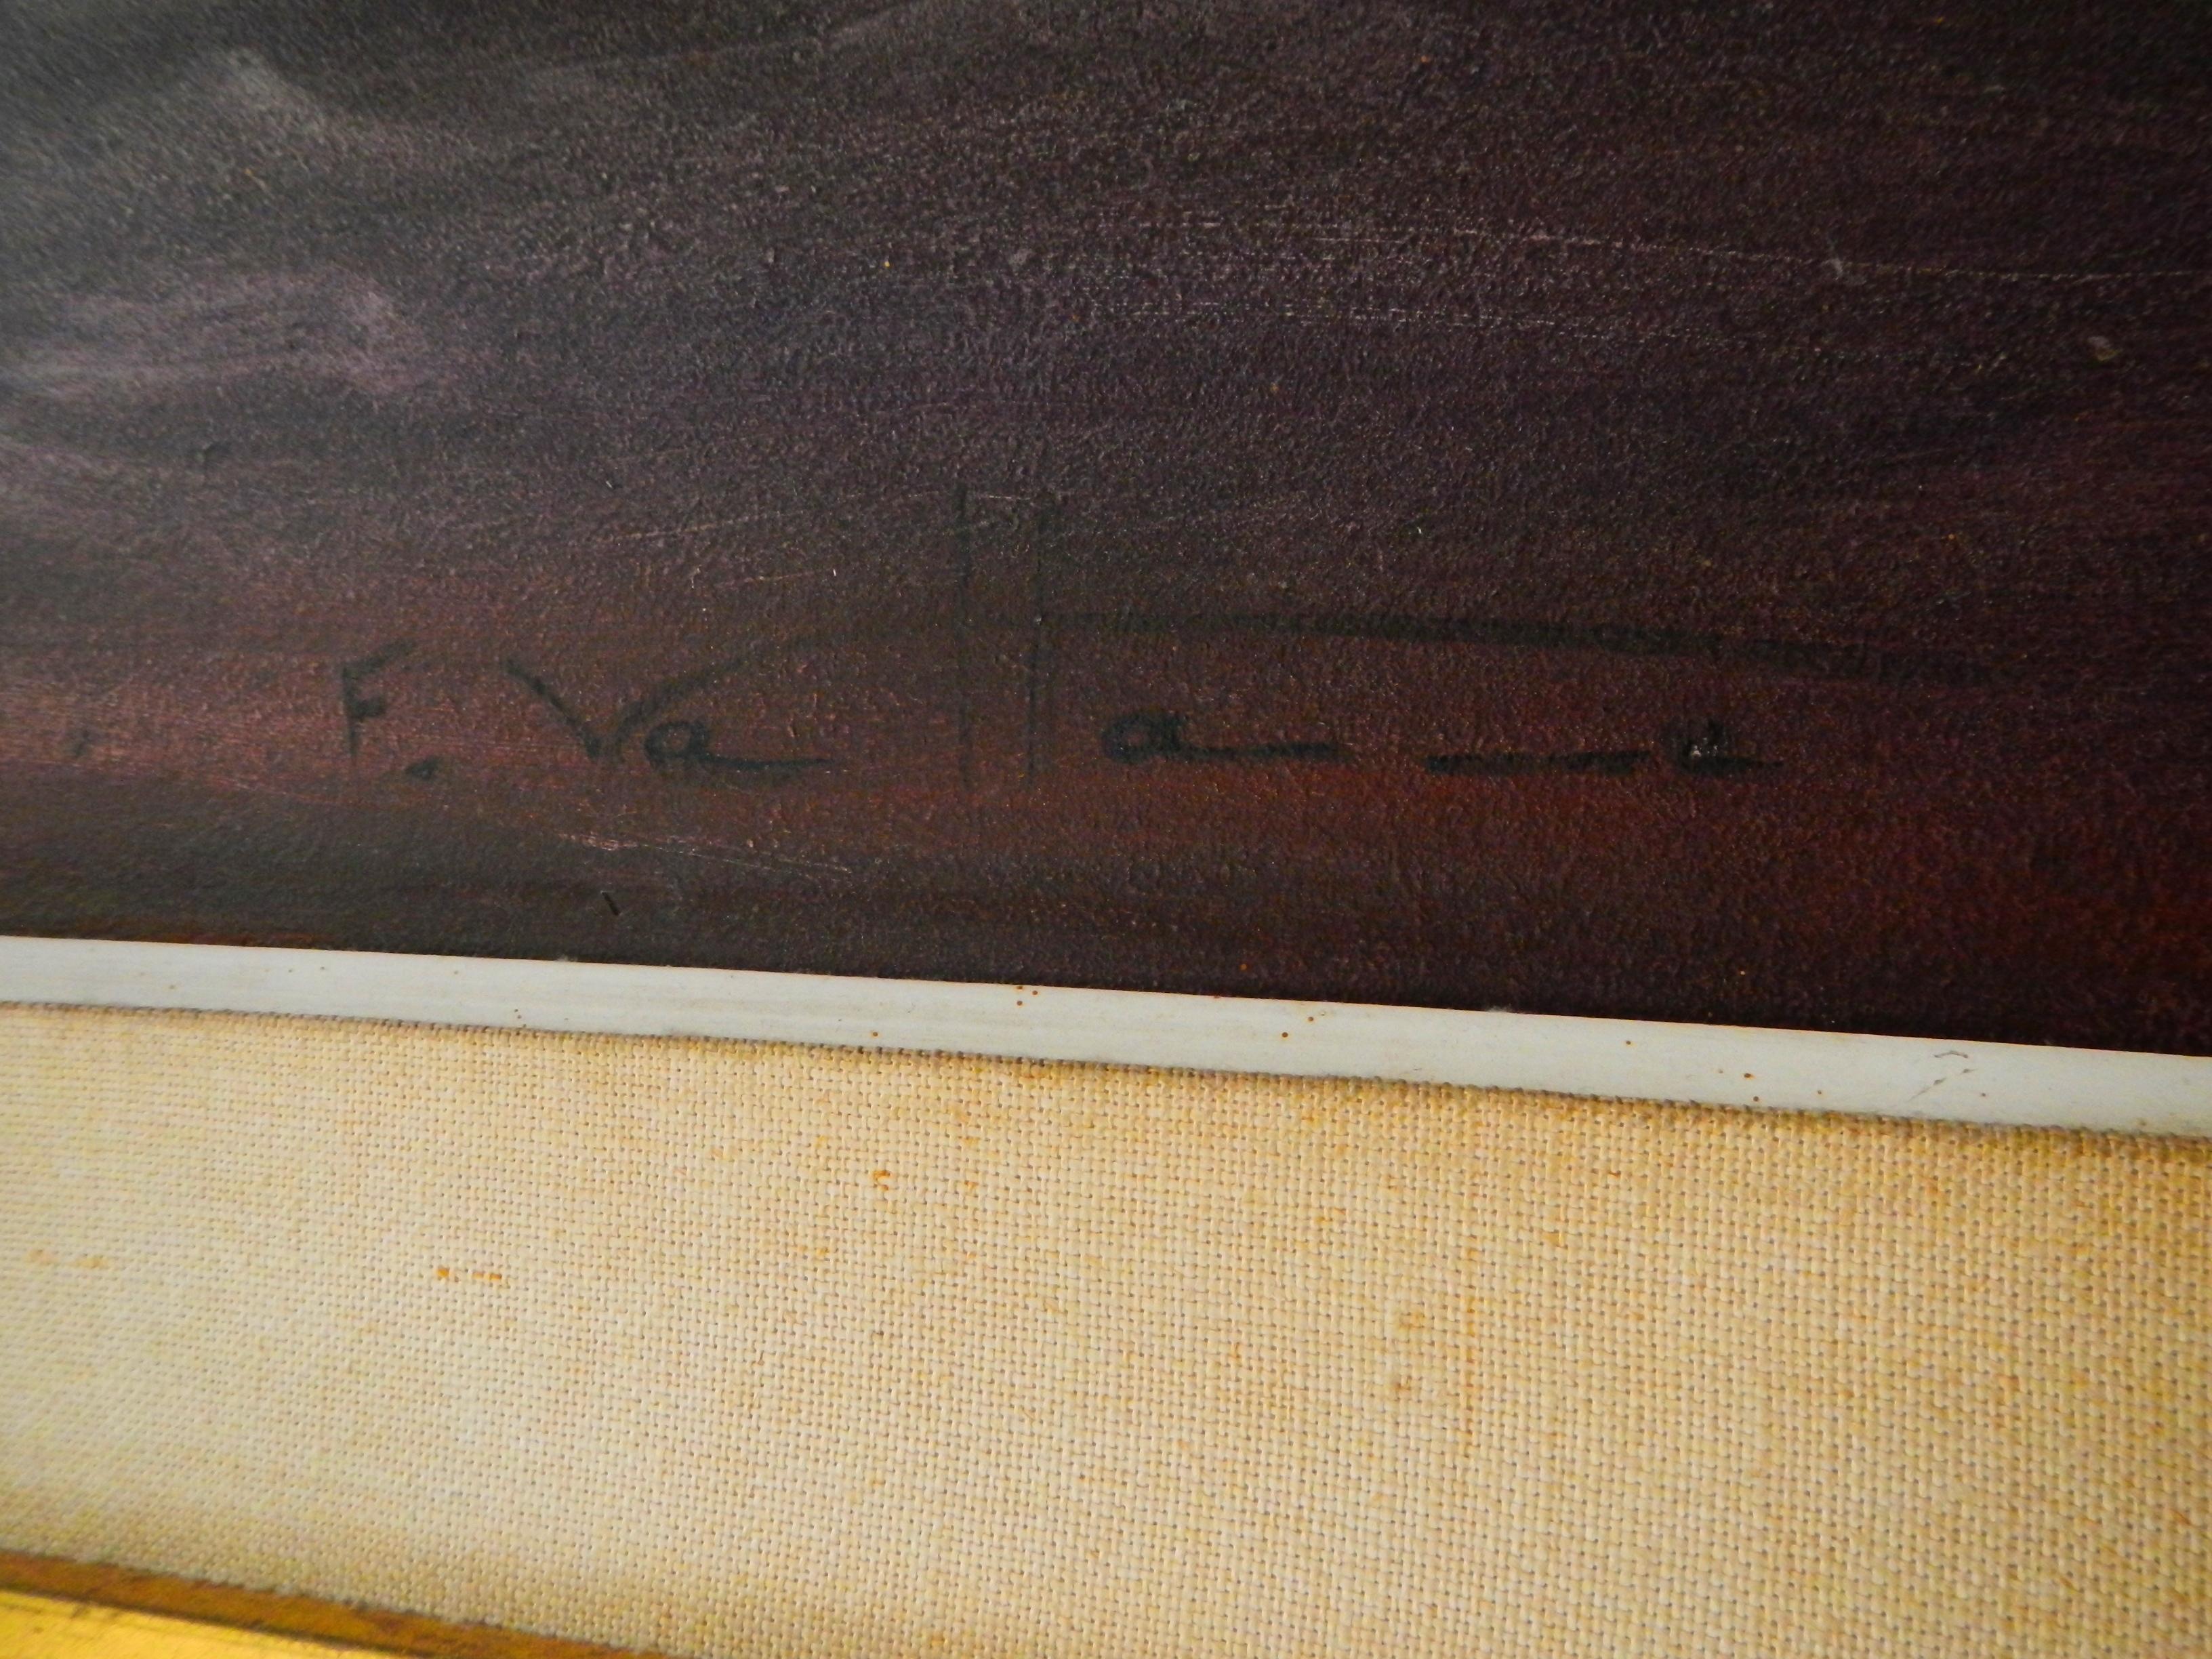 Van_Hamme_Fernand_-_La_création_de_la_vie_-_signature